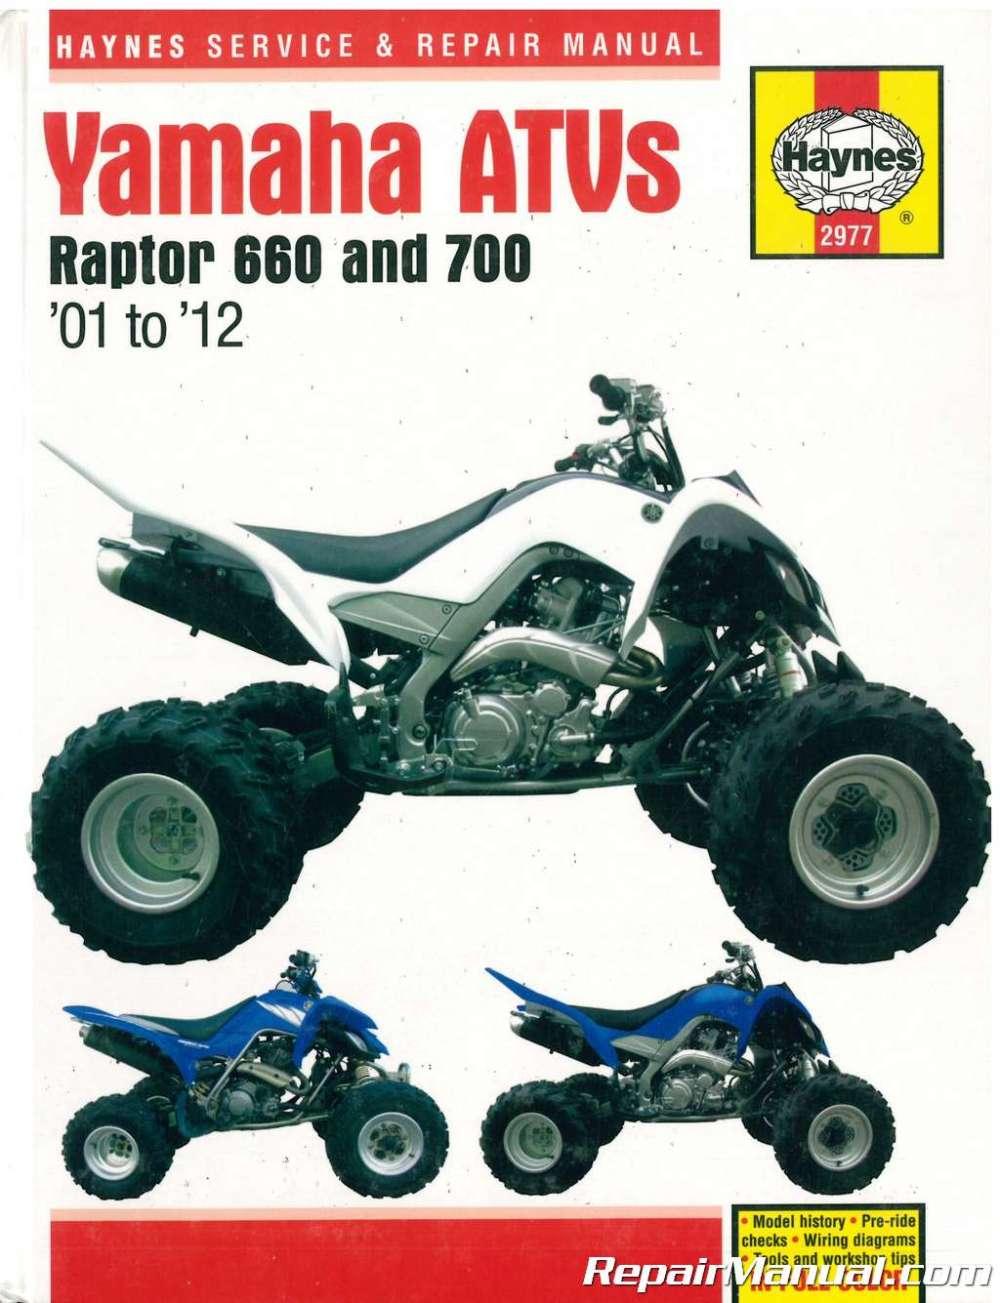 medium resolution of yamaha raptor 660 700 2001 2012 atv repair manual